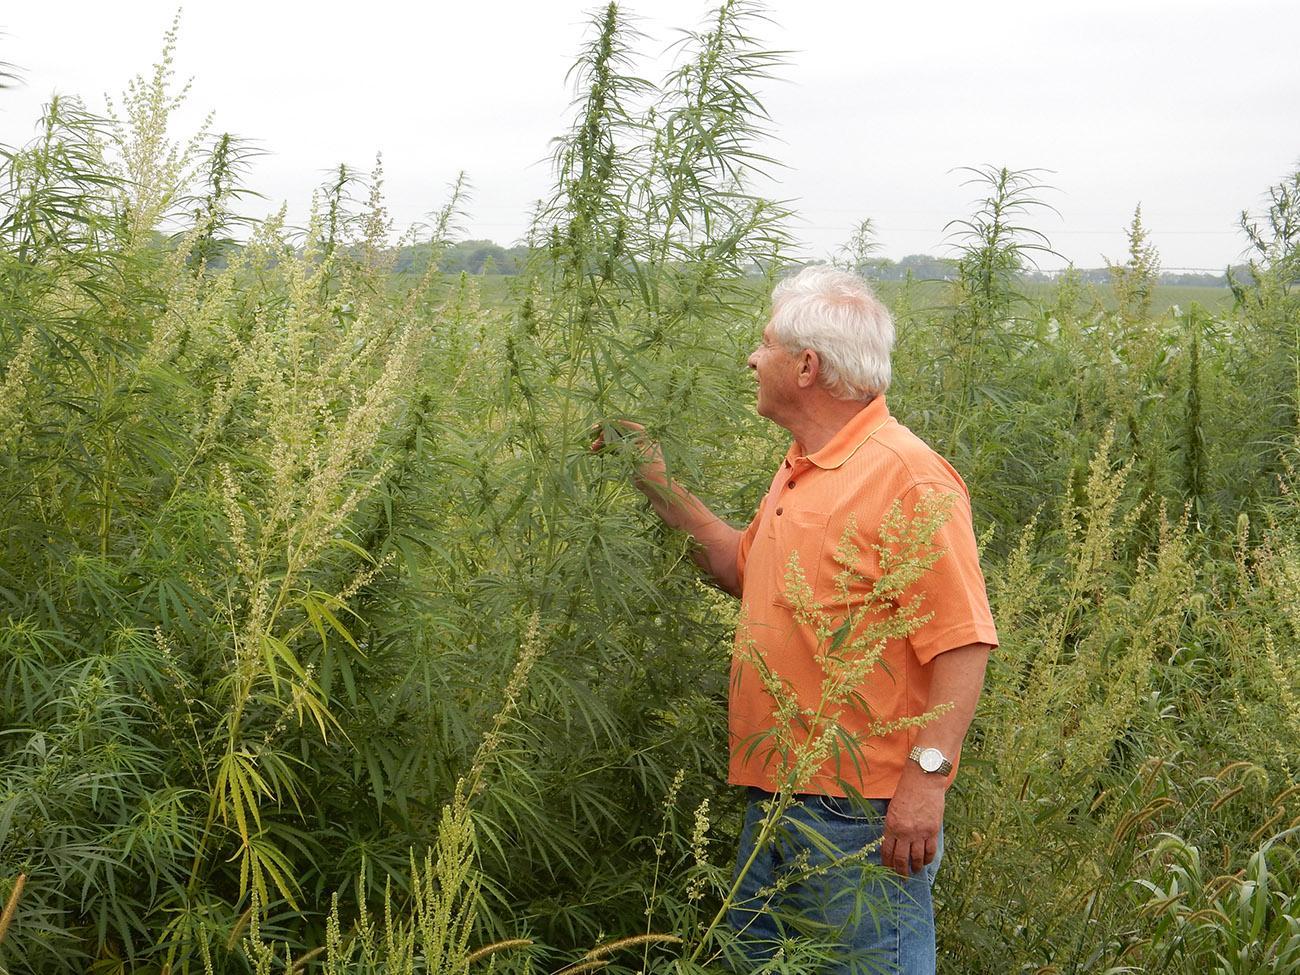 University of Nebraska-Lincoln researcher Ismail Dweikat examines industrial hemp being grown in eastern Nebraska research plots.